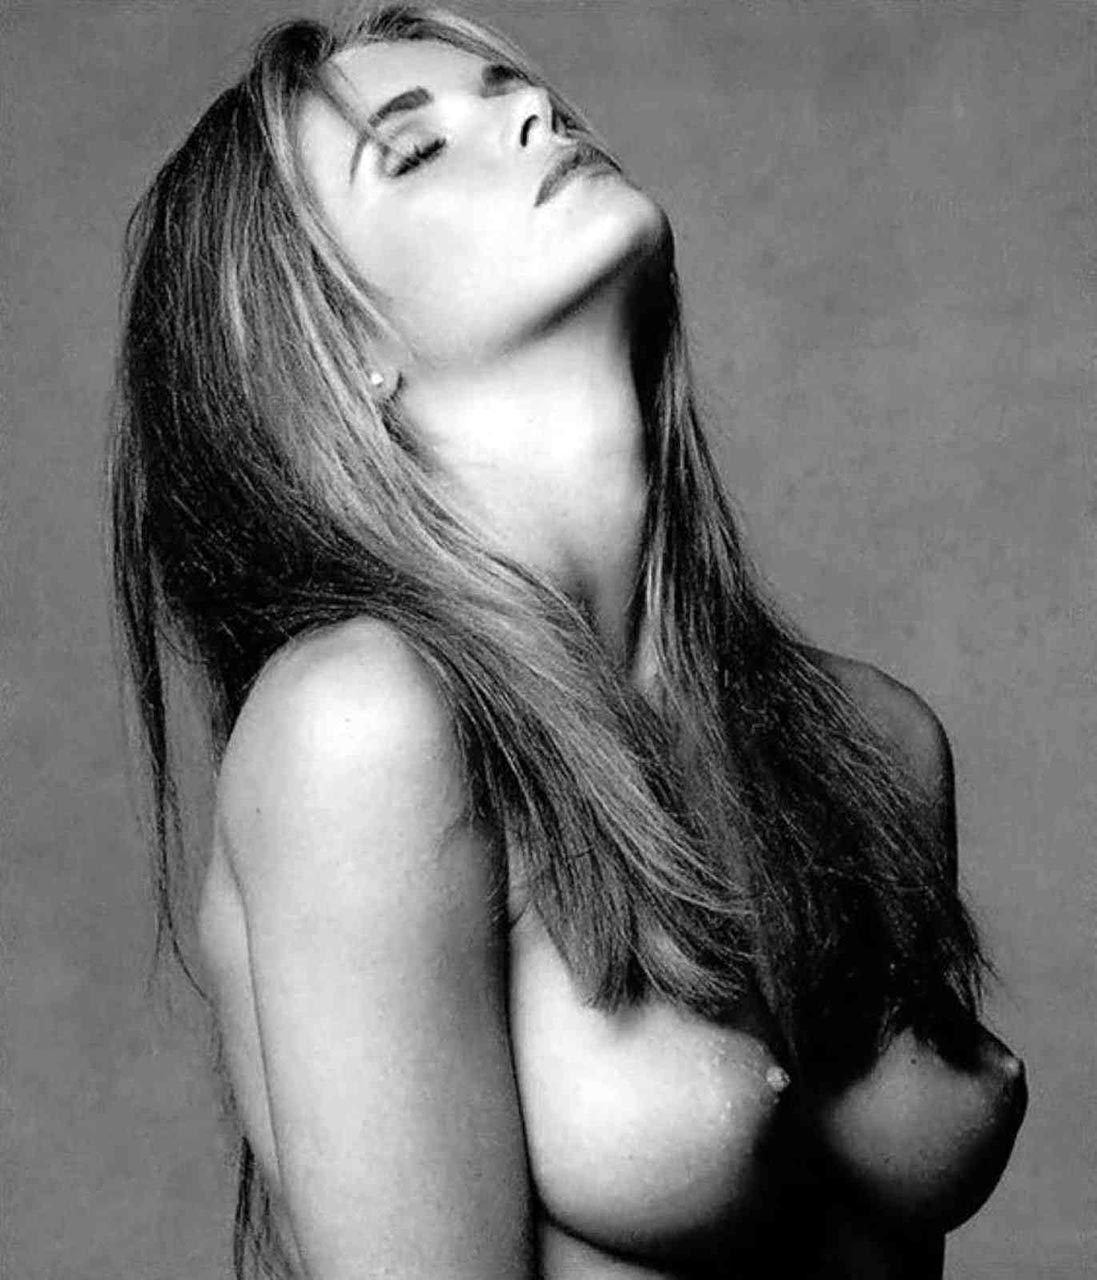 Elle macpherson black and white nudes photos 529